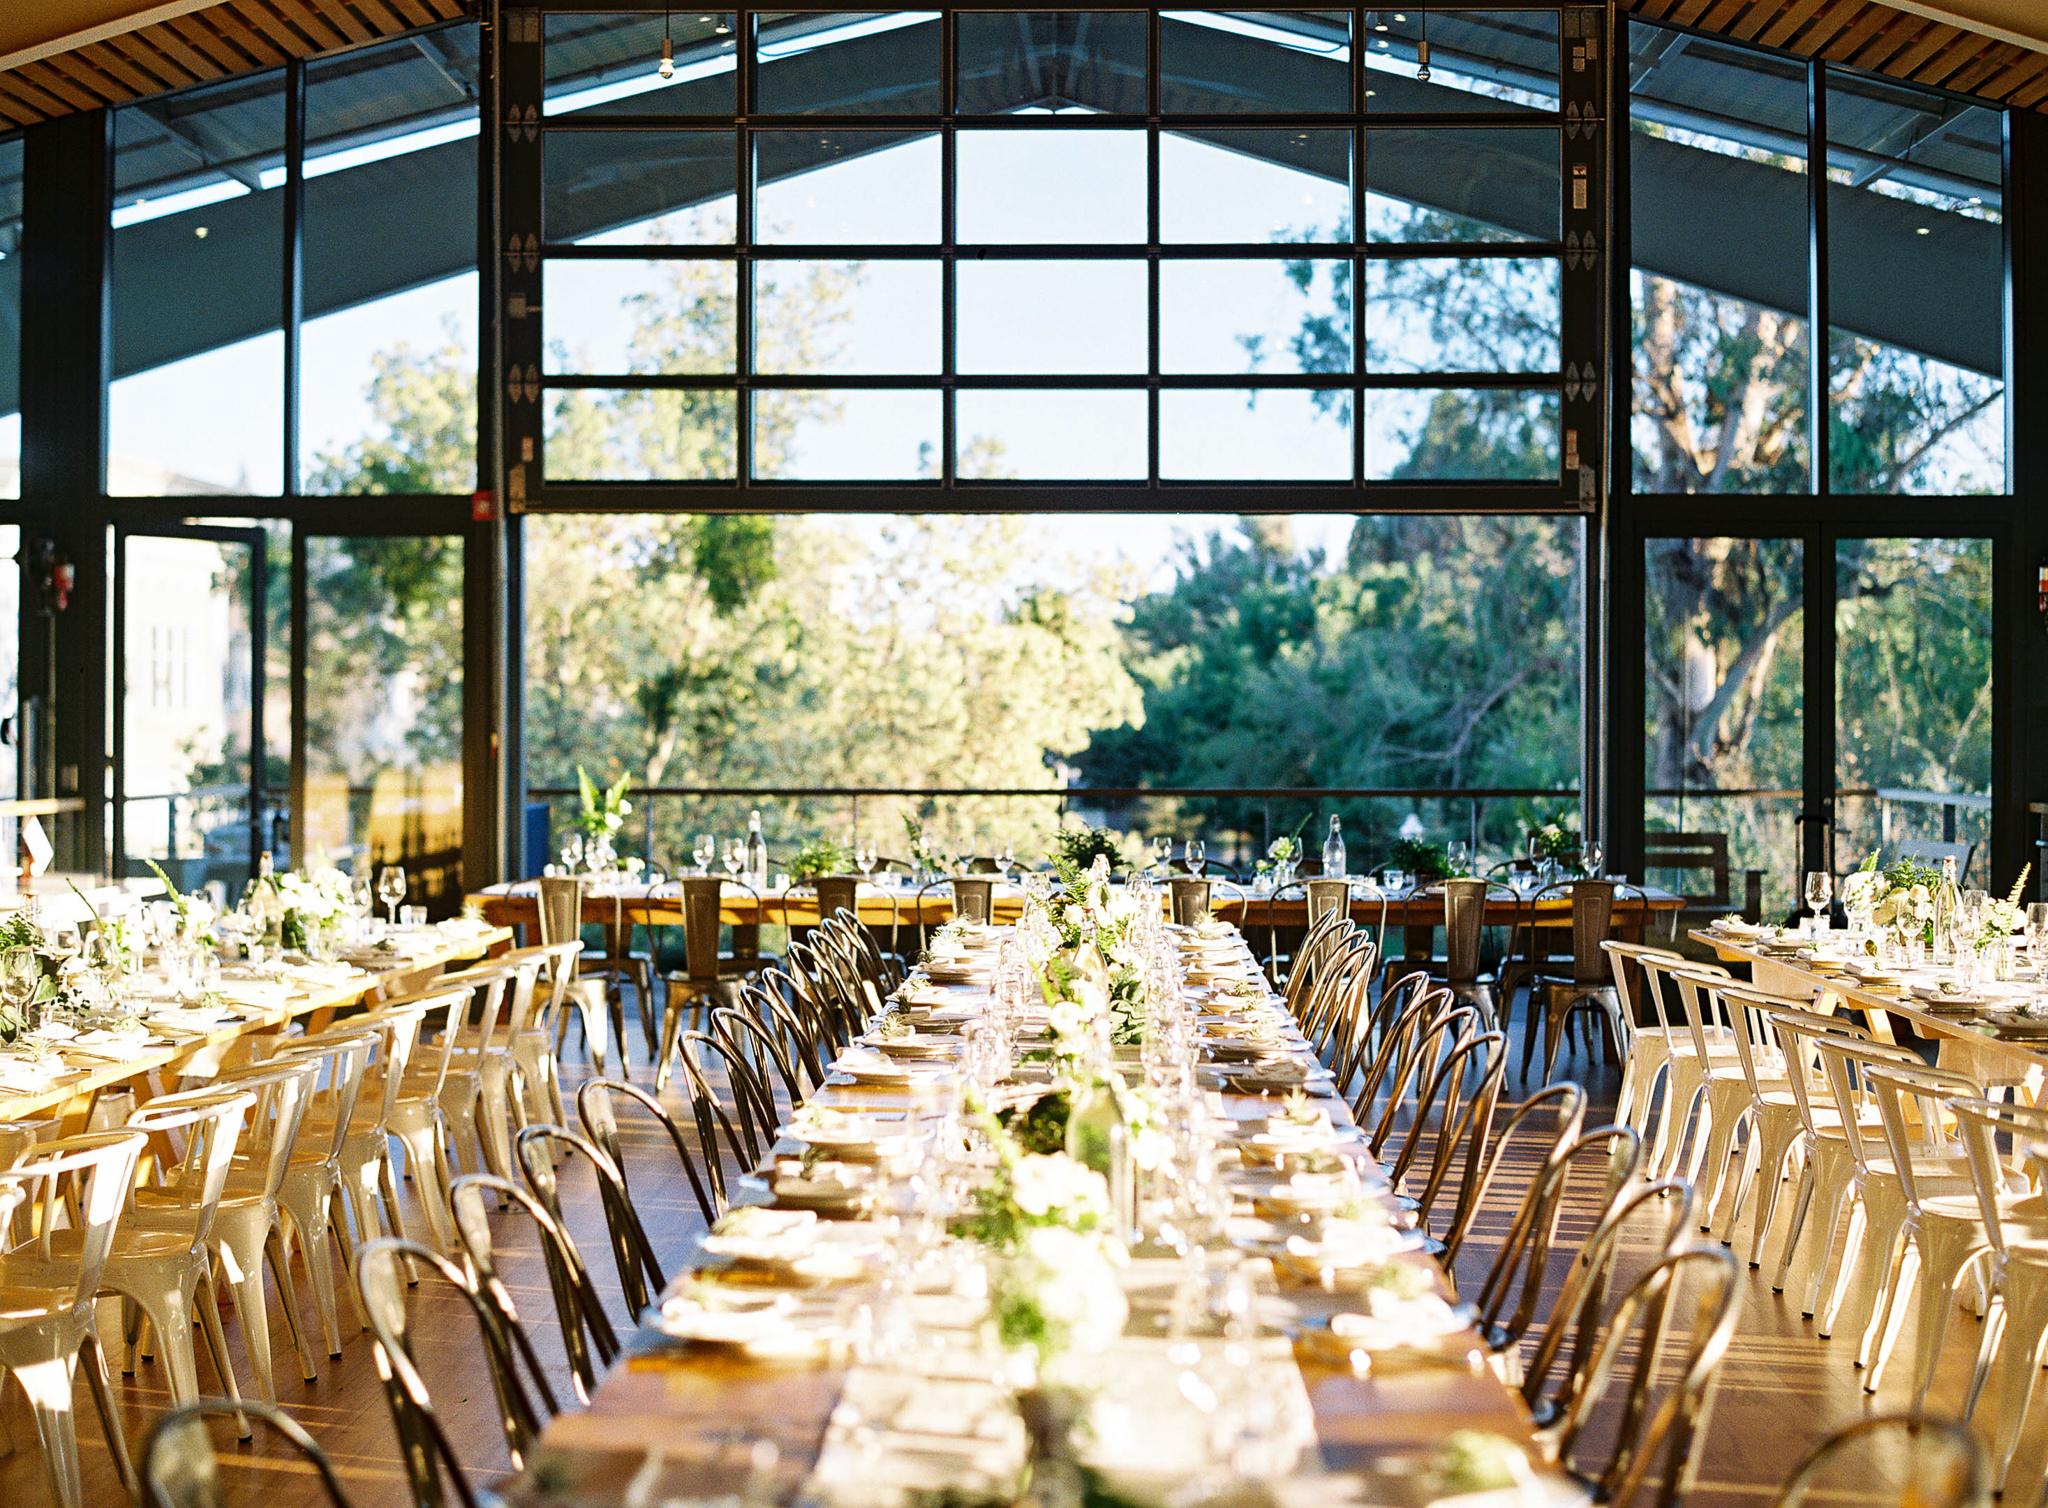 Meghan Mehan Photography - Fine Art Film Wedding Photography - San Francisco   Napa   Sonoma   Big Sur   Chicago   Minneapolis   Milwaukee   Lake Geneva   Door County   Wisconsin 084.jpg